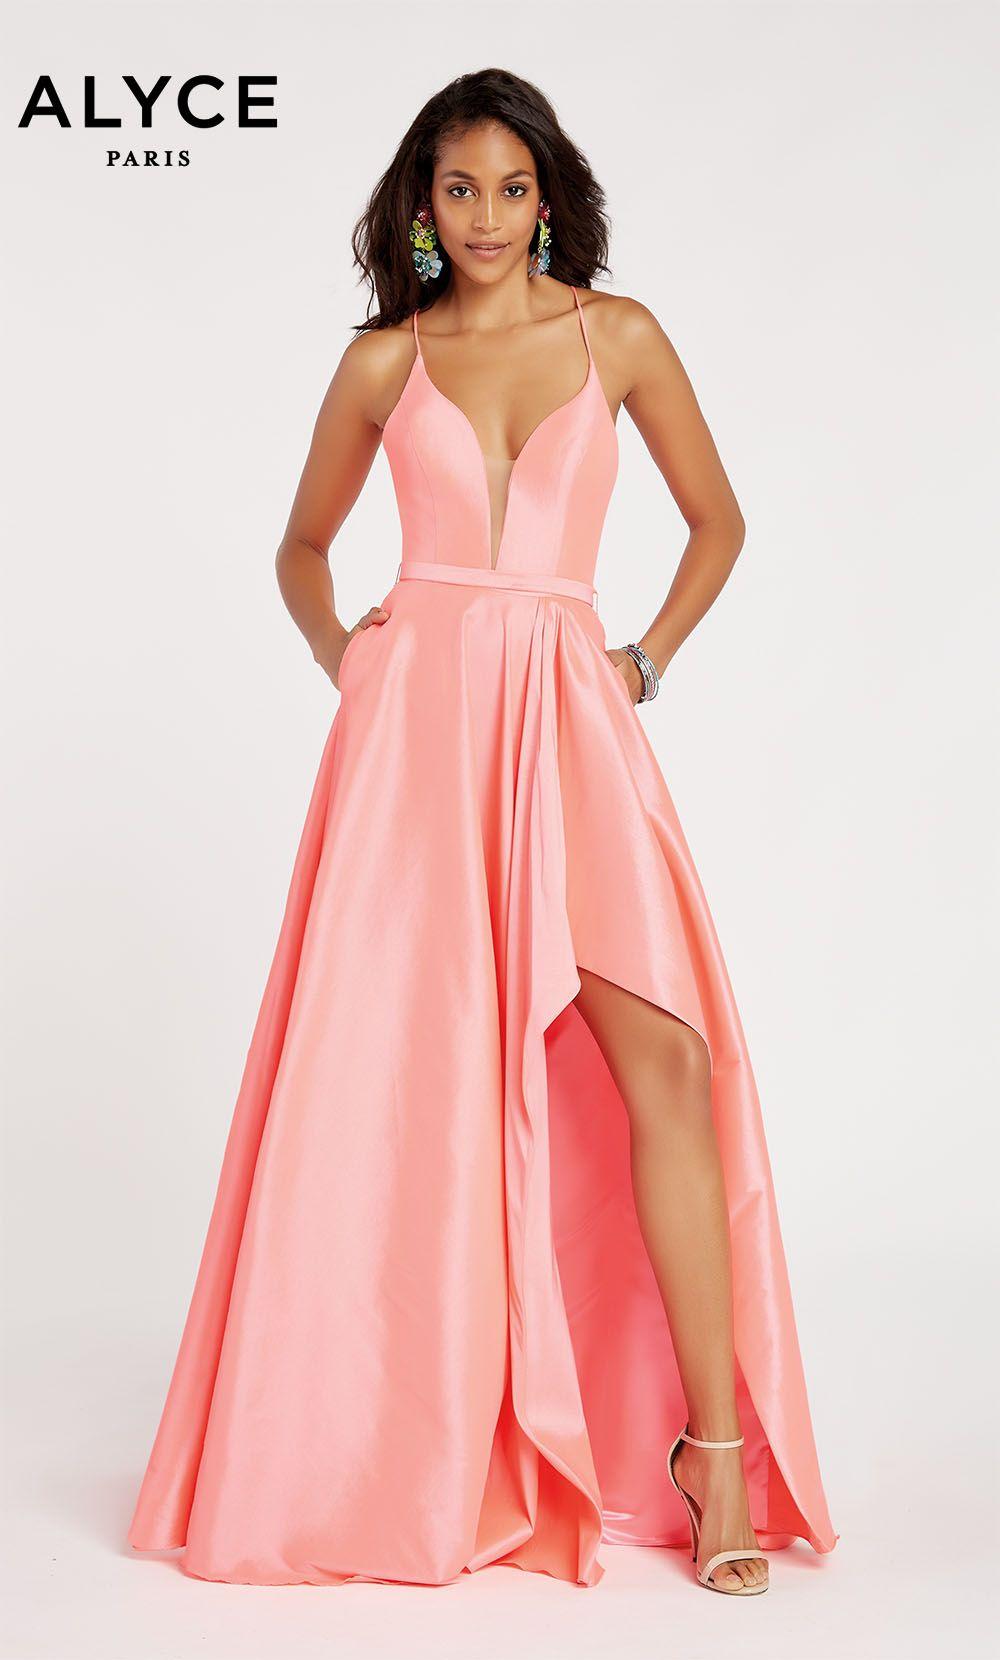 0146d99359 Alyce Paris 60394 - International Prom Association #lookswelove  #promdressesipa